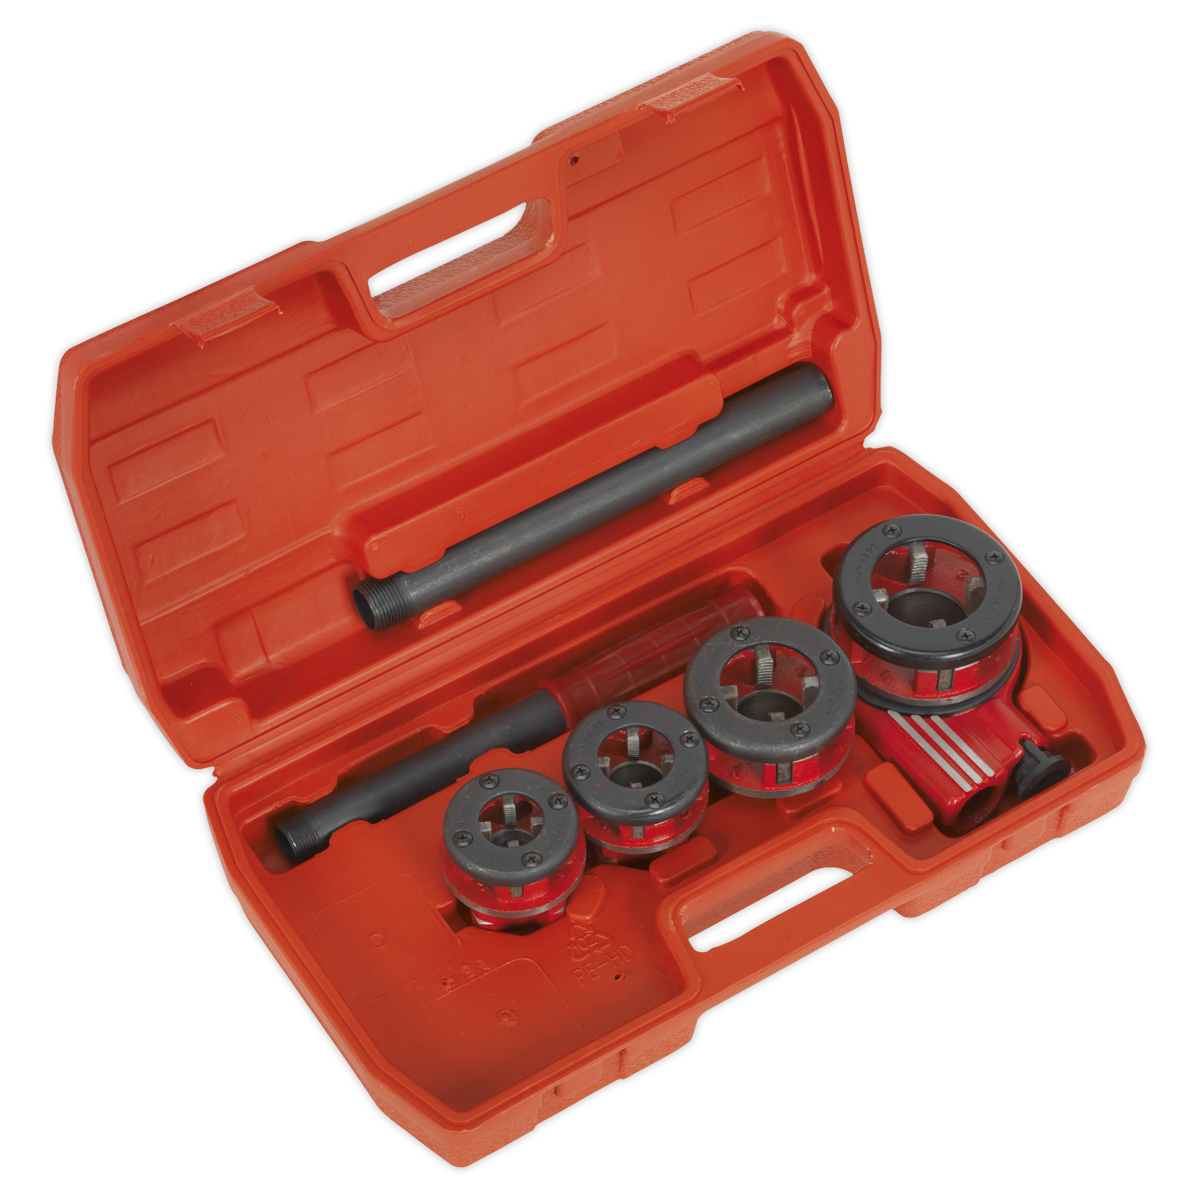 Sealey PTK992 Pipe Threading Set 7Pc 3//8 2Bspt Workshop Garage Equipment